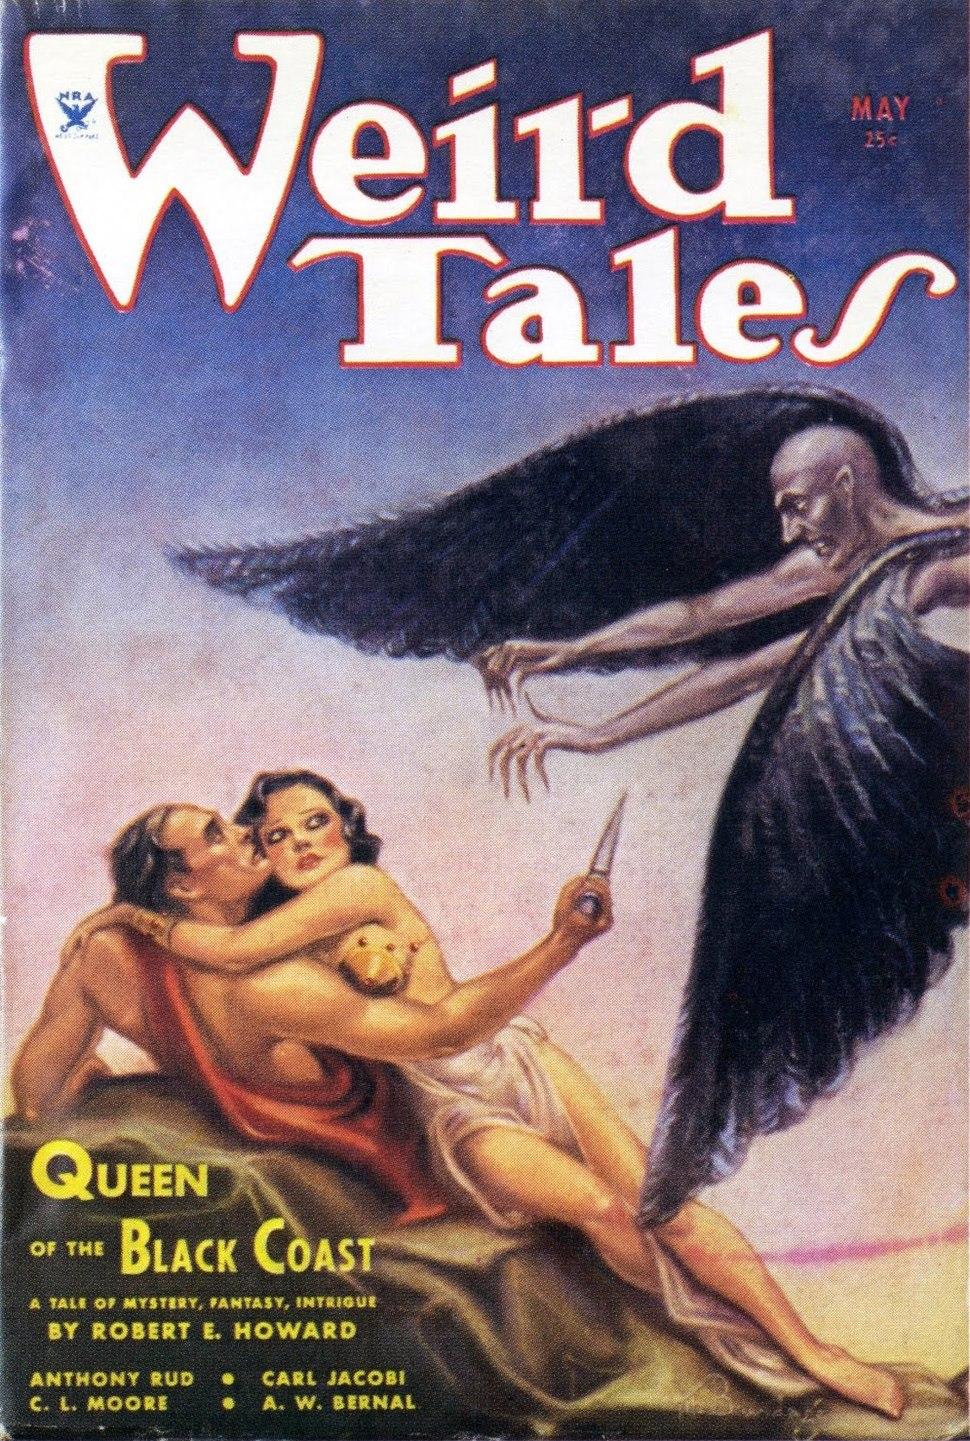 Weird Tales 1934-05 - Queen of the Black Coast